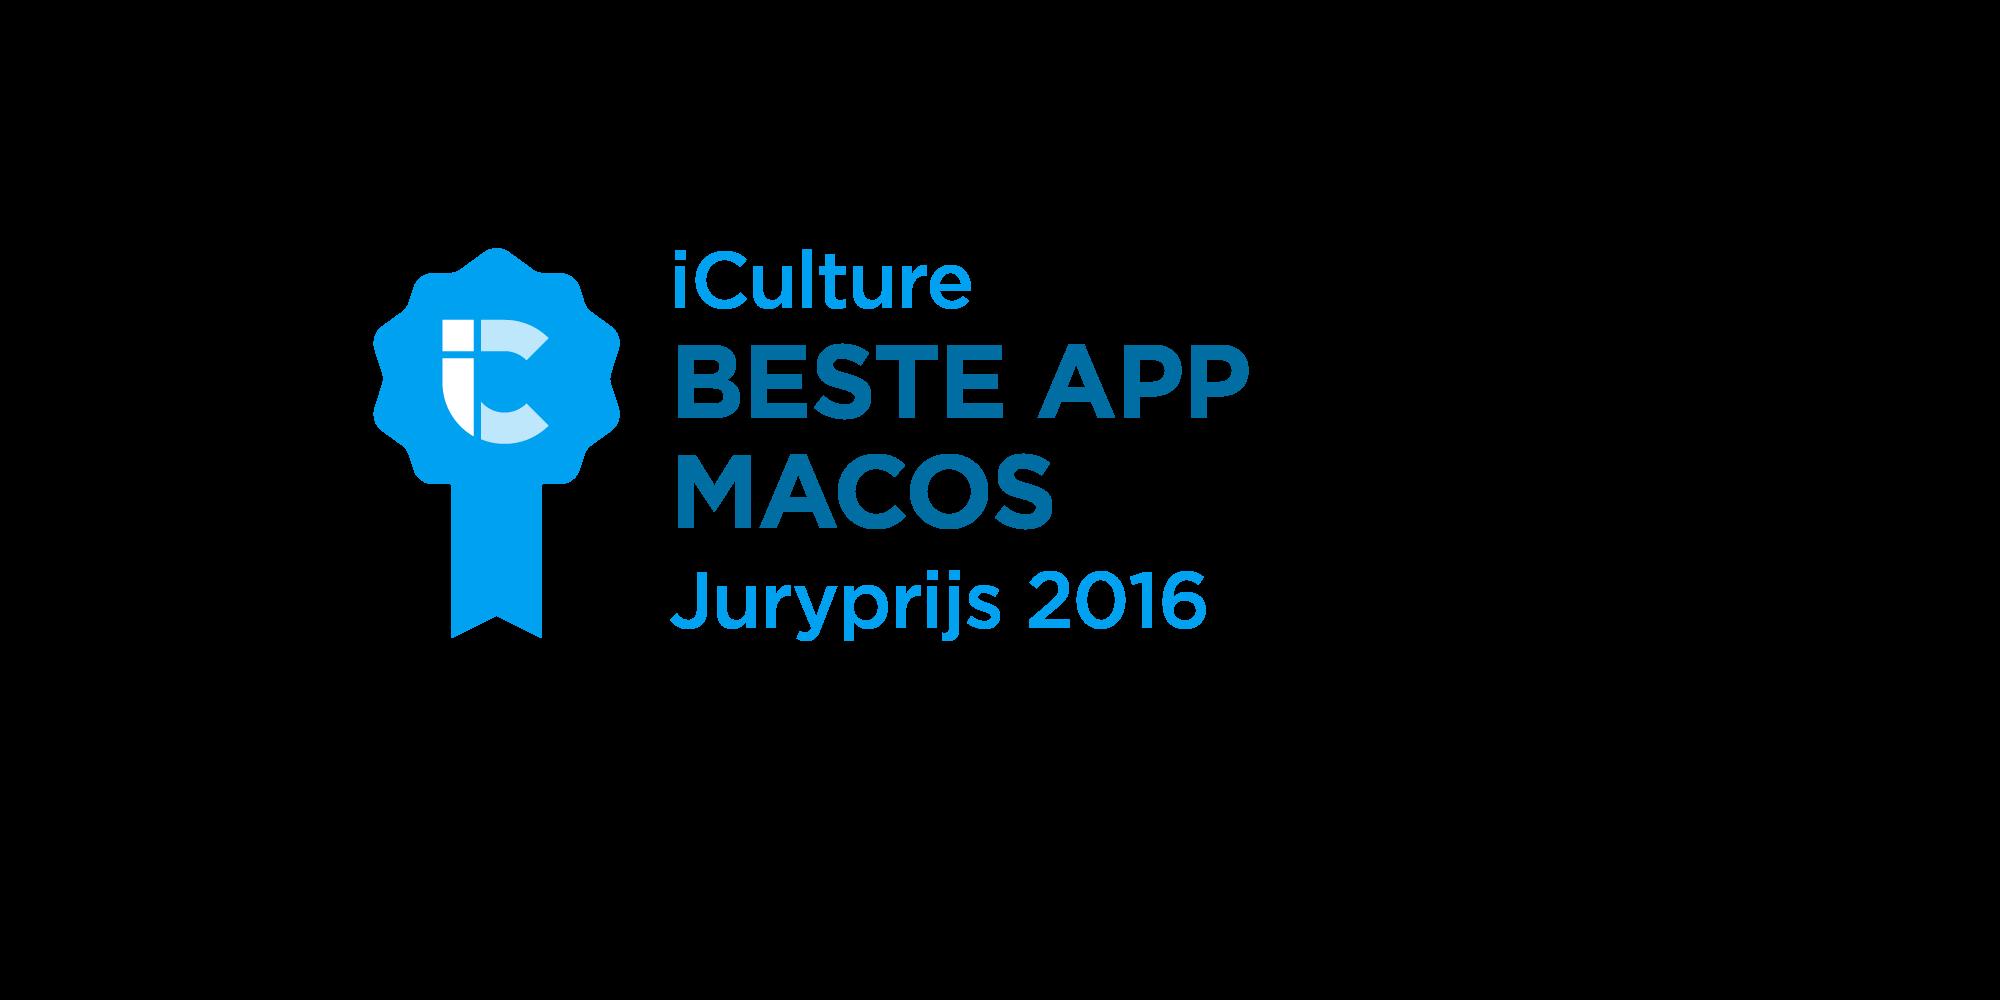 iCulture Beste App macOS 2016